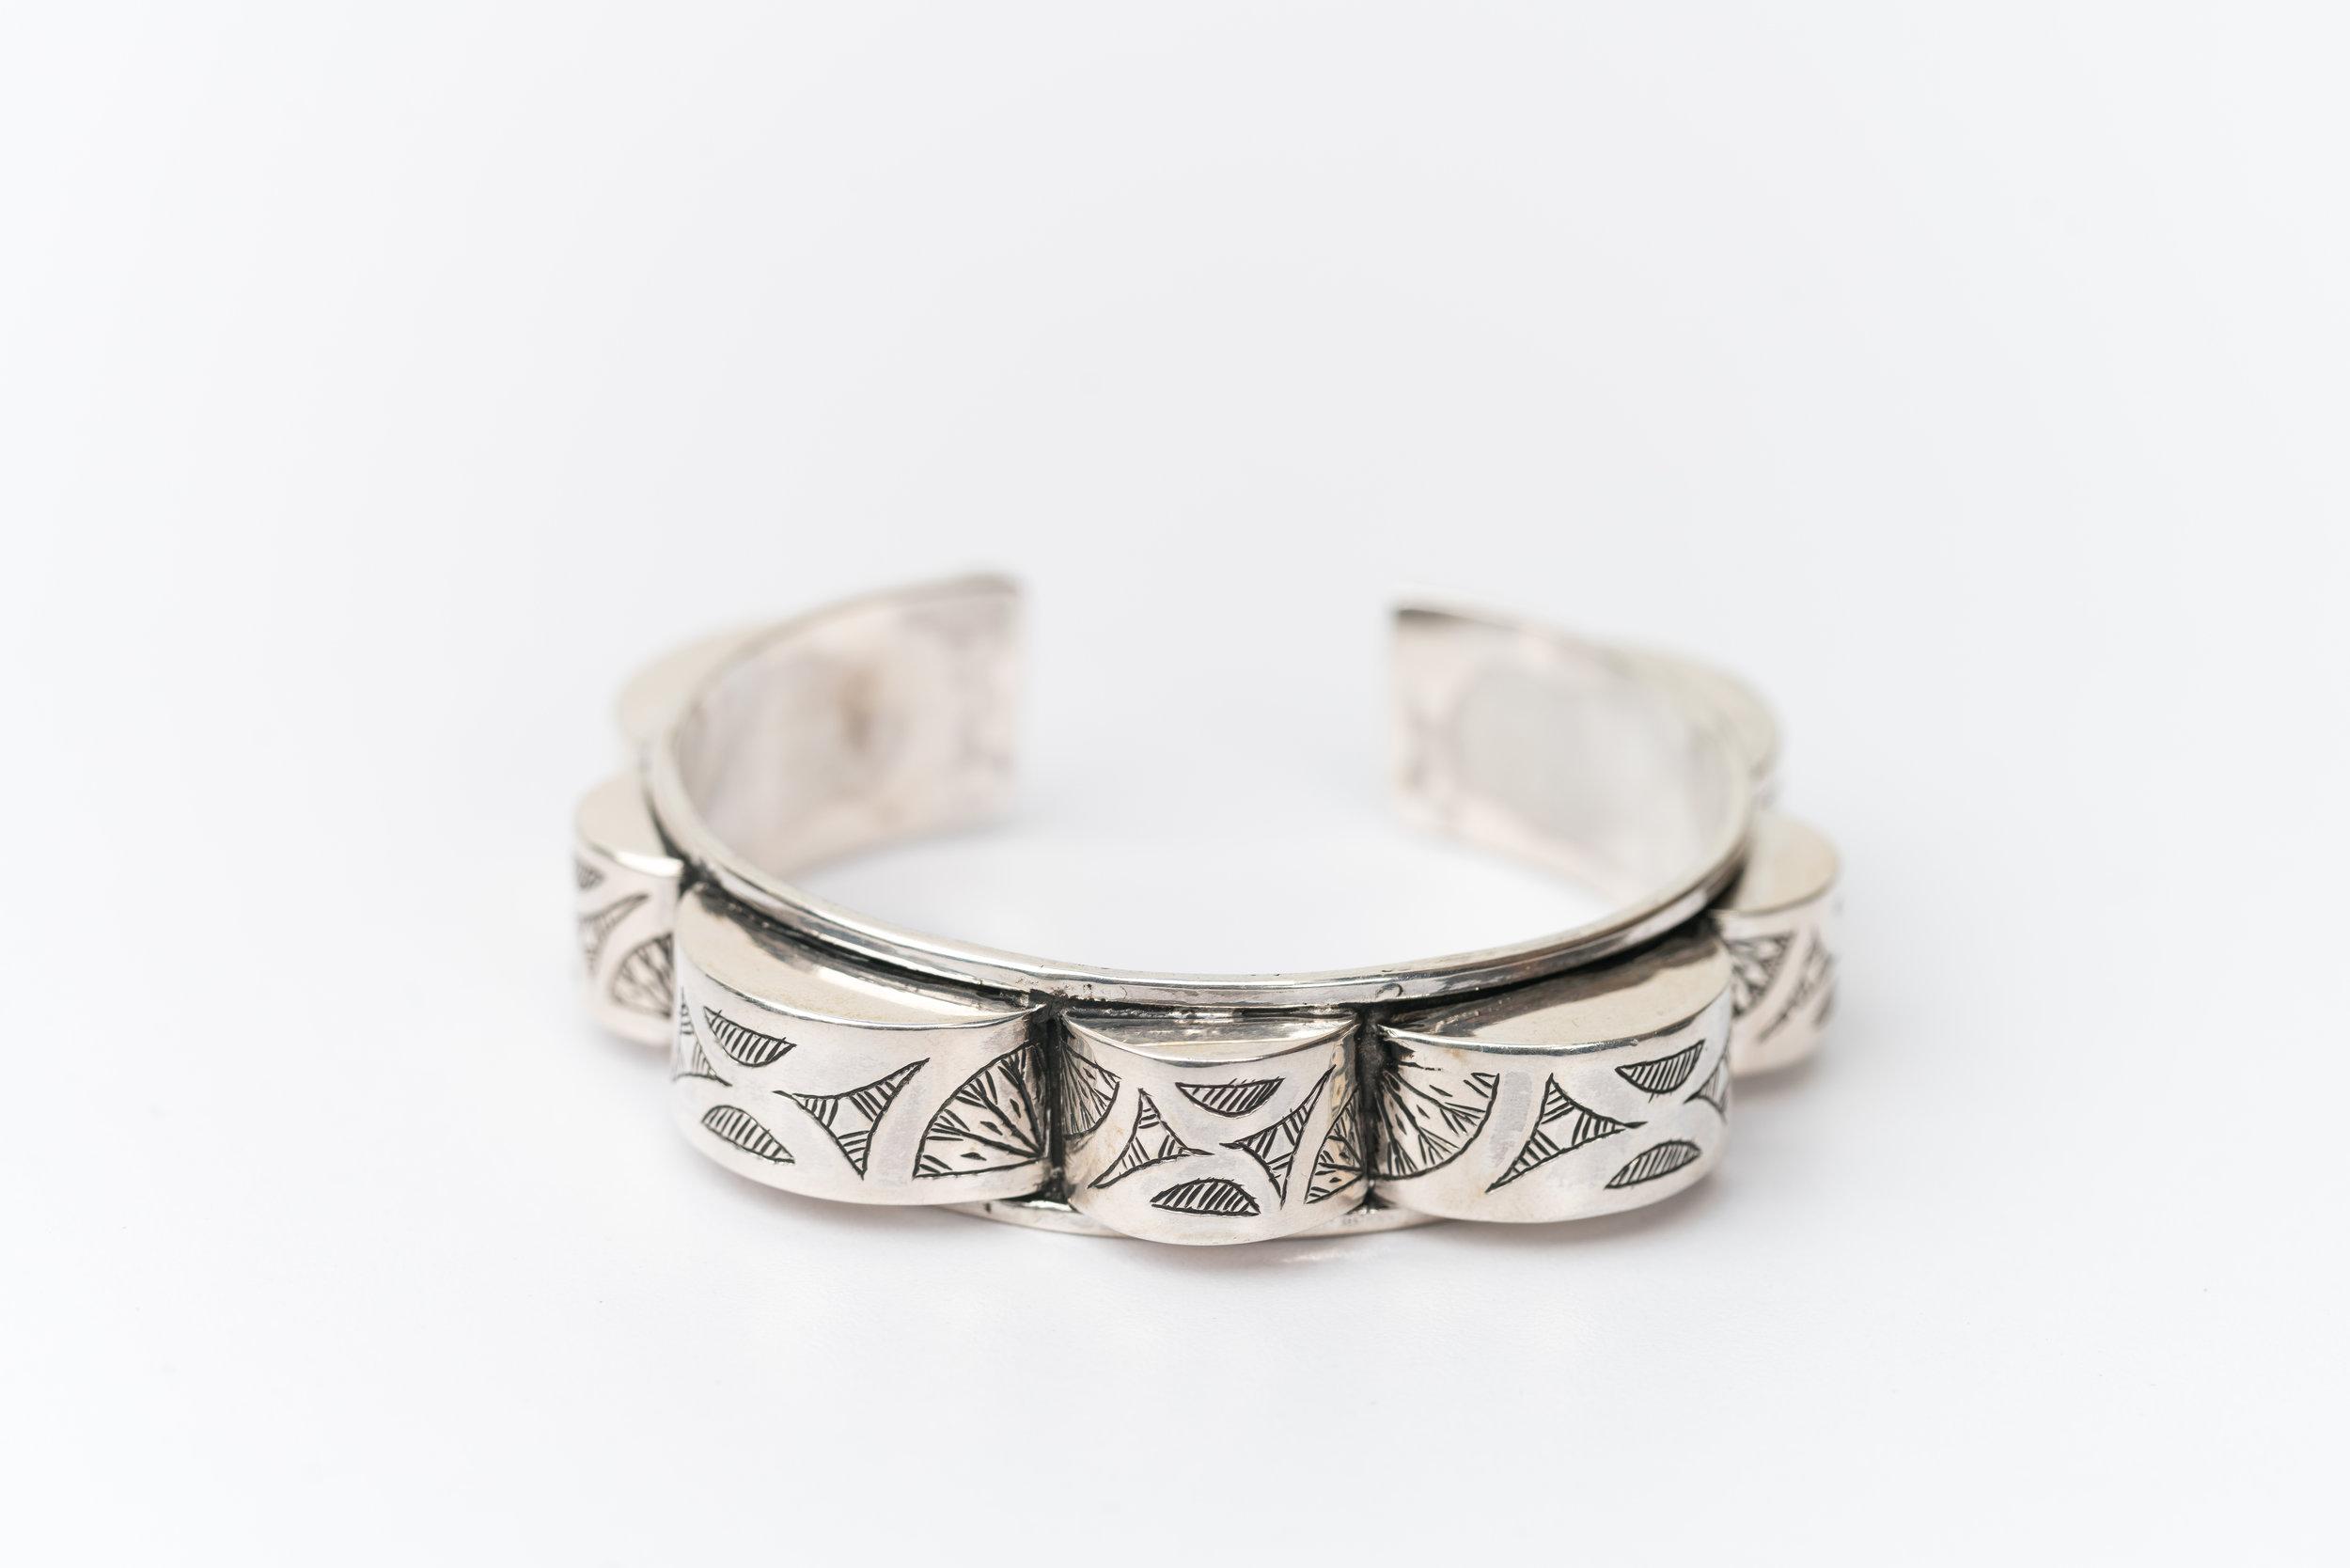 Al_Bawma Silver bracelet.jpg